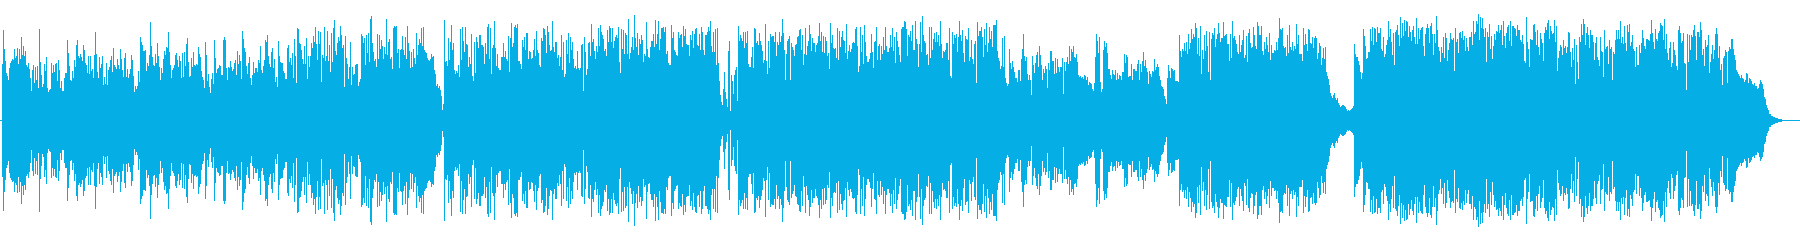 J-POP風スタイリッシュバラードの再生済みの波形